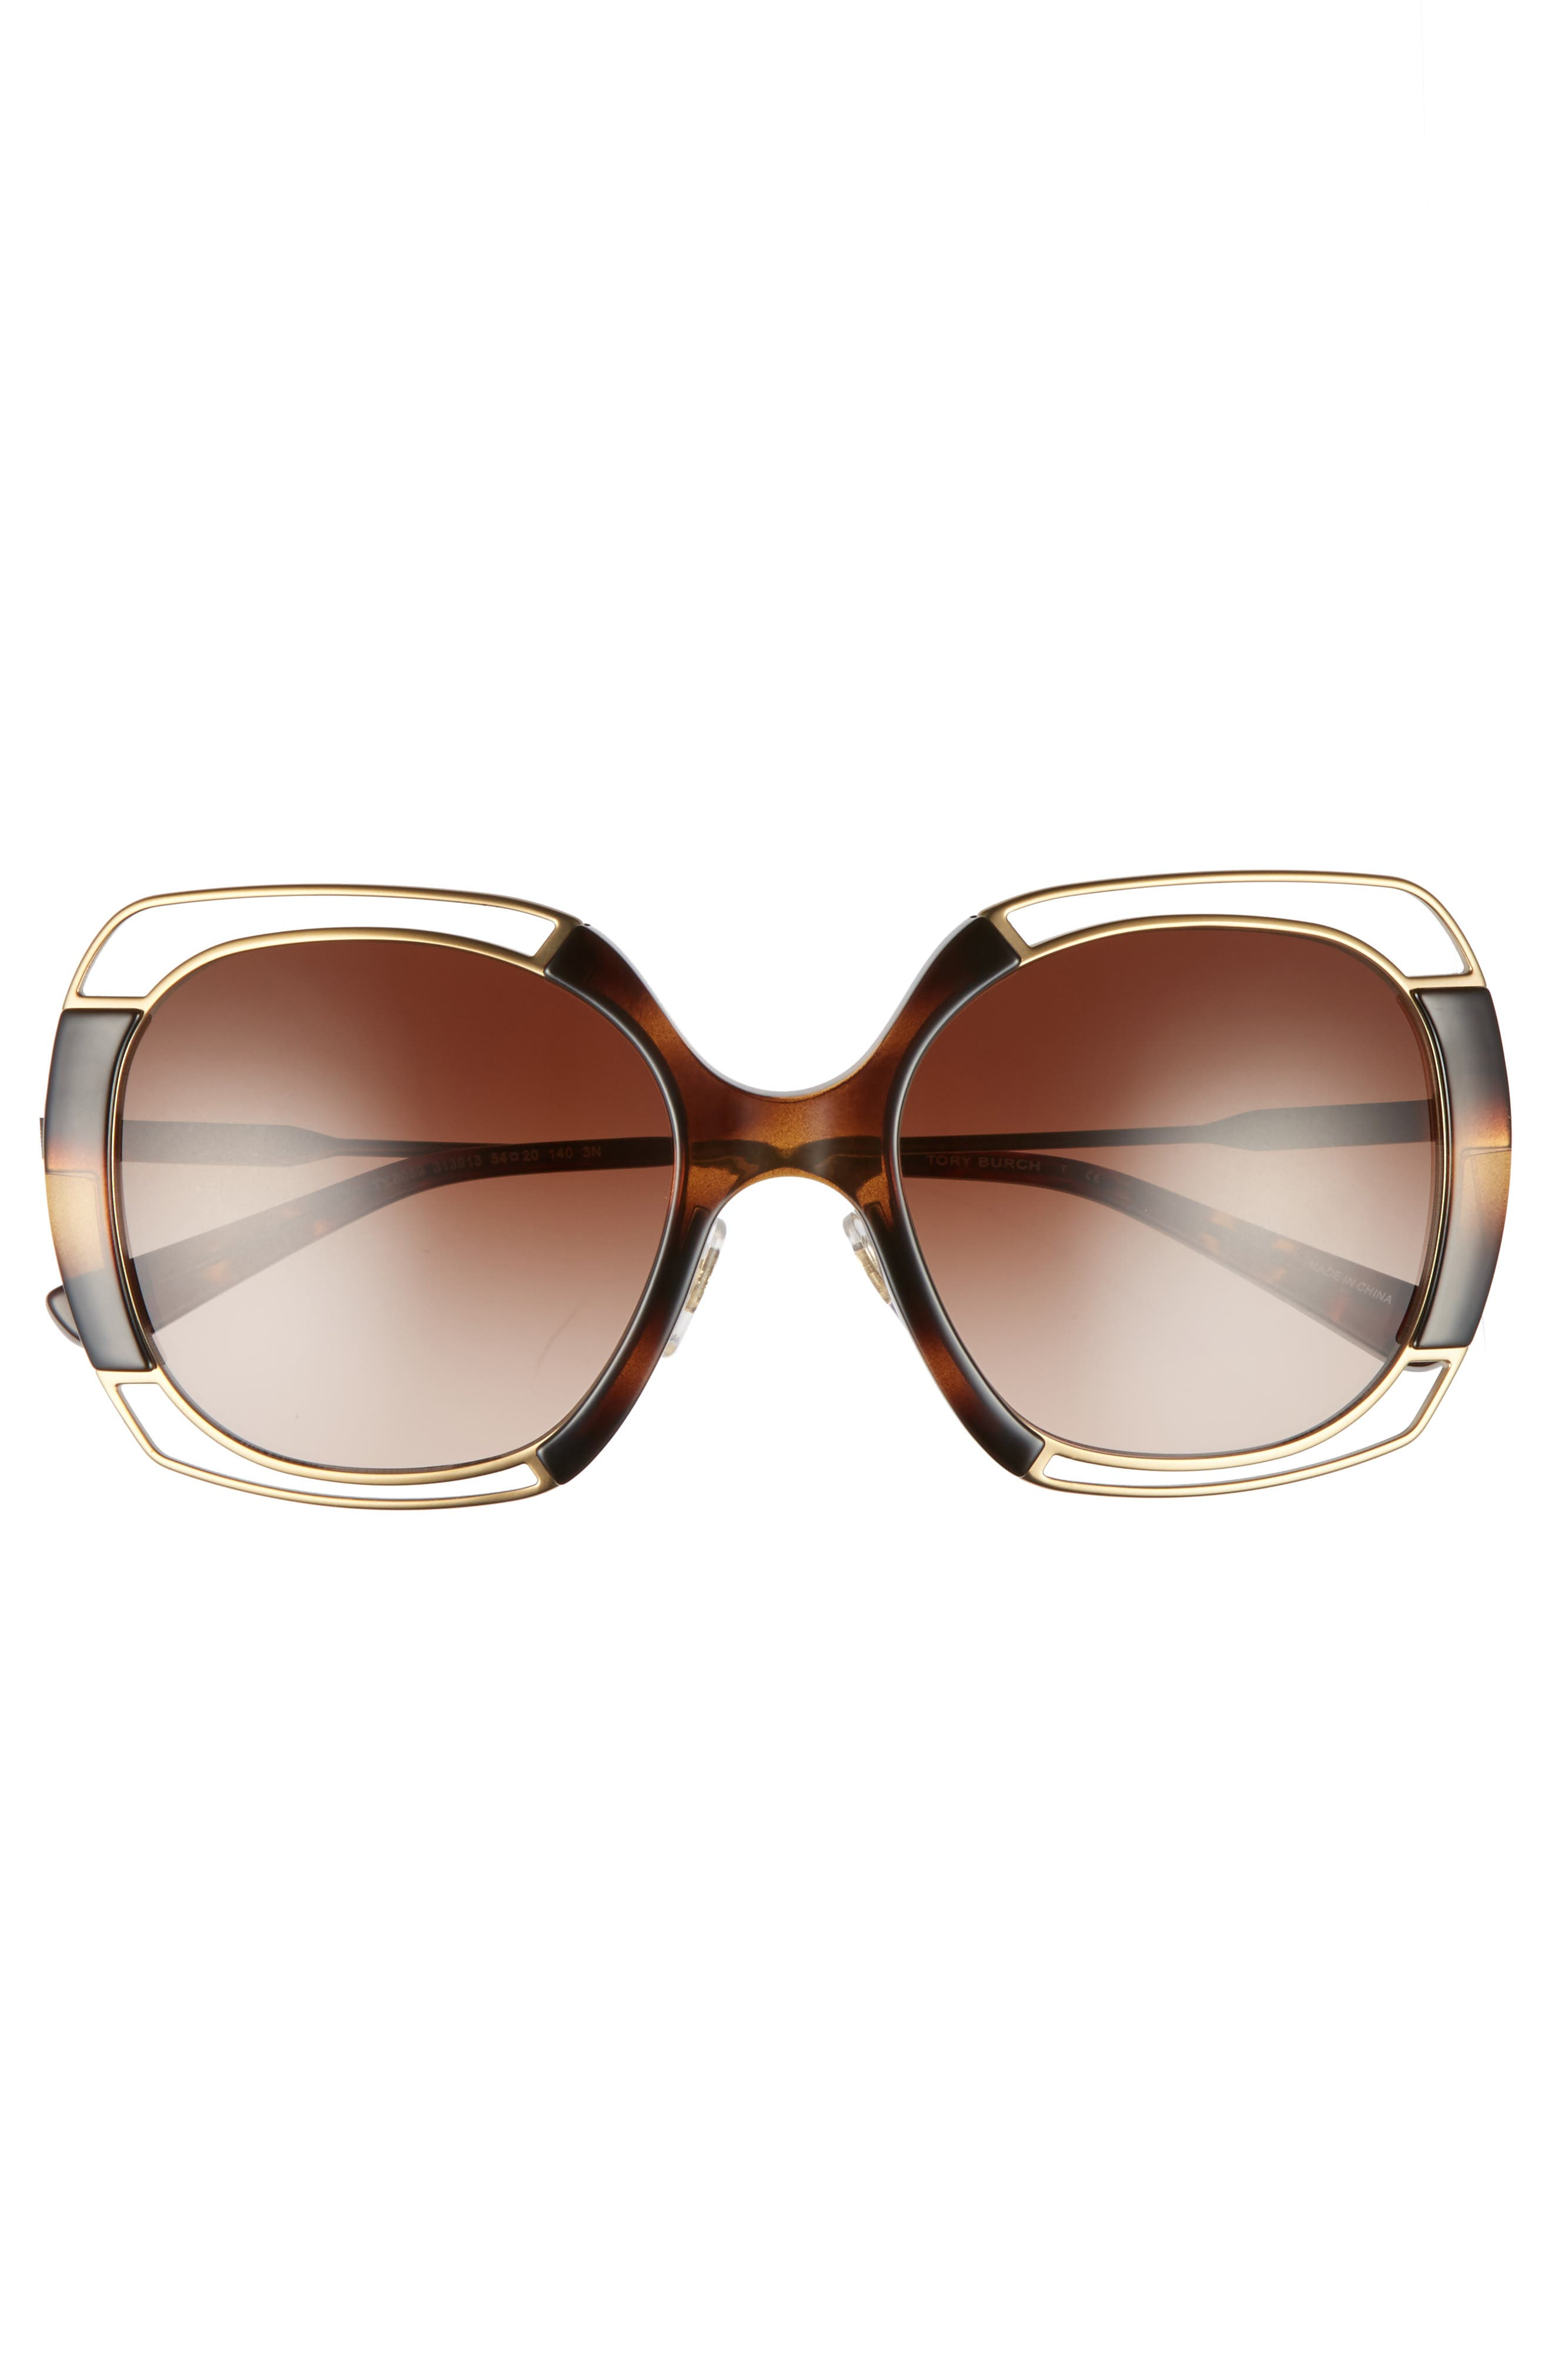 54mm Square Gradient Sunglasses,                             Alternate thumbnail 8, color,